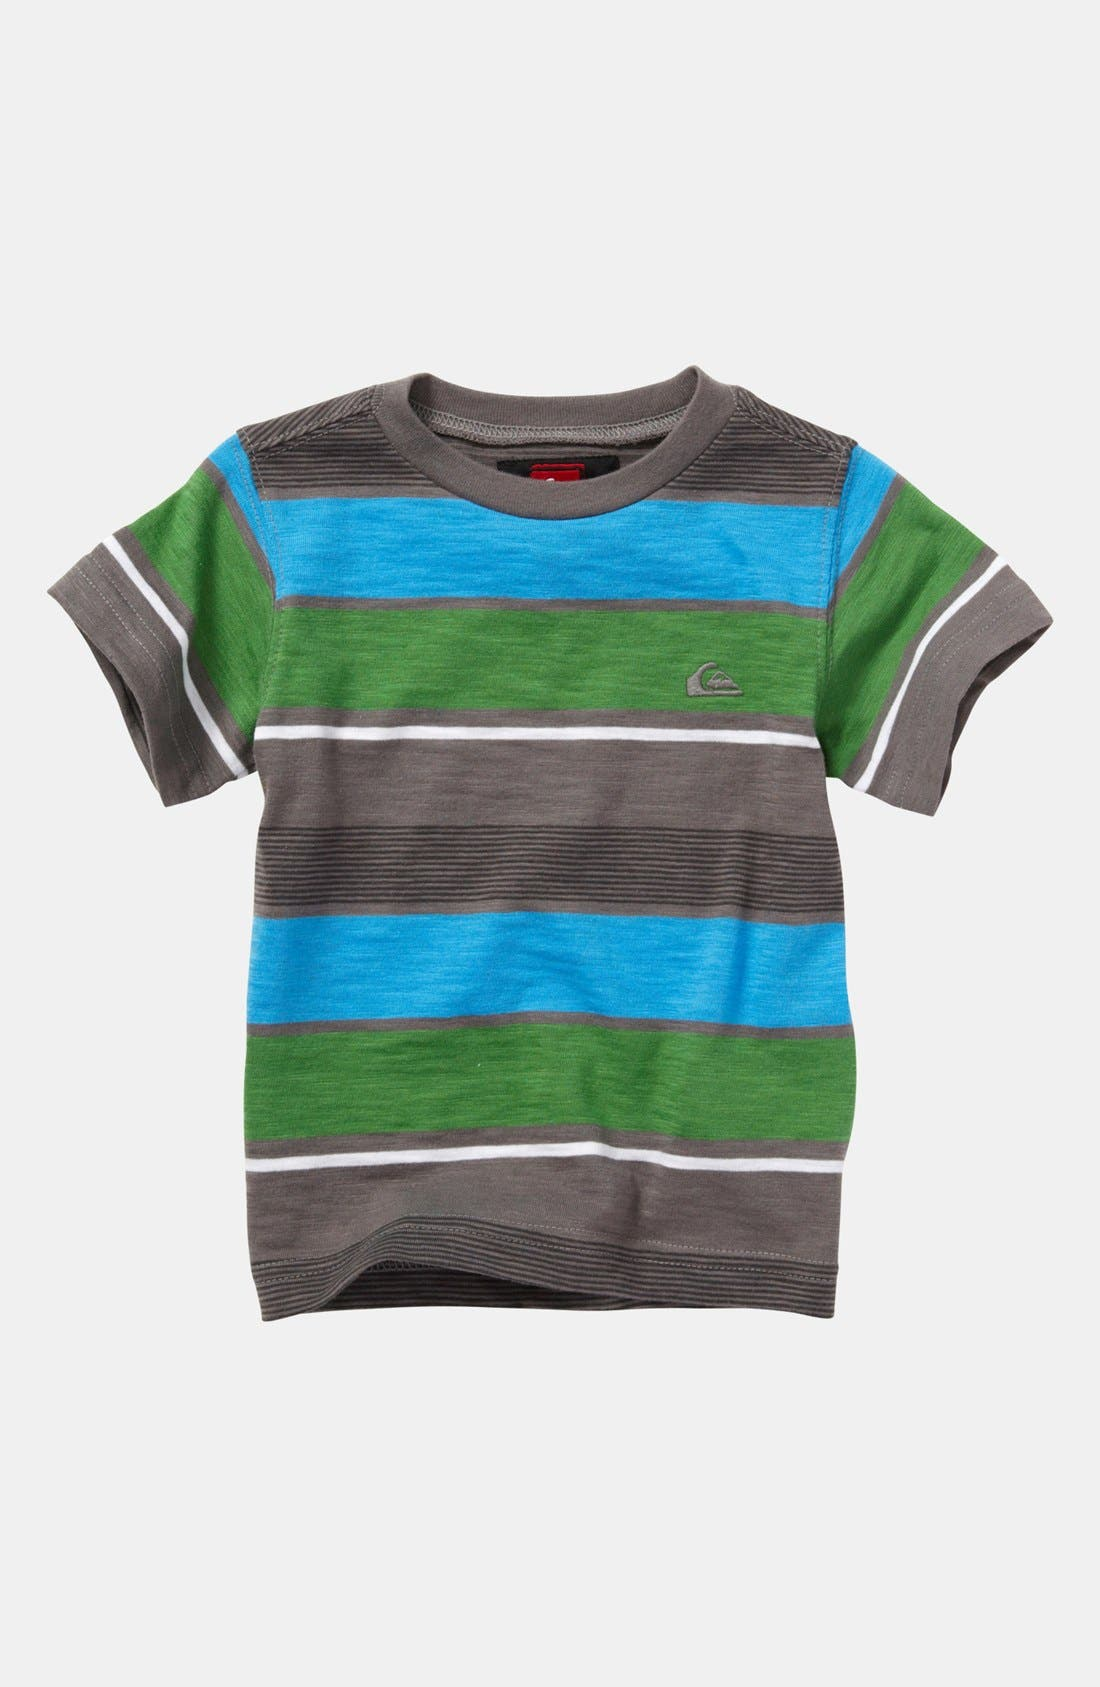 Main Image - Quiksilver 'Brookhurst' T-Shirt (Baby)